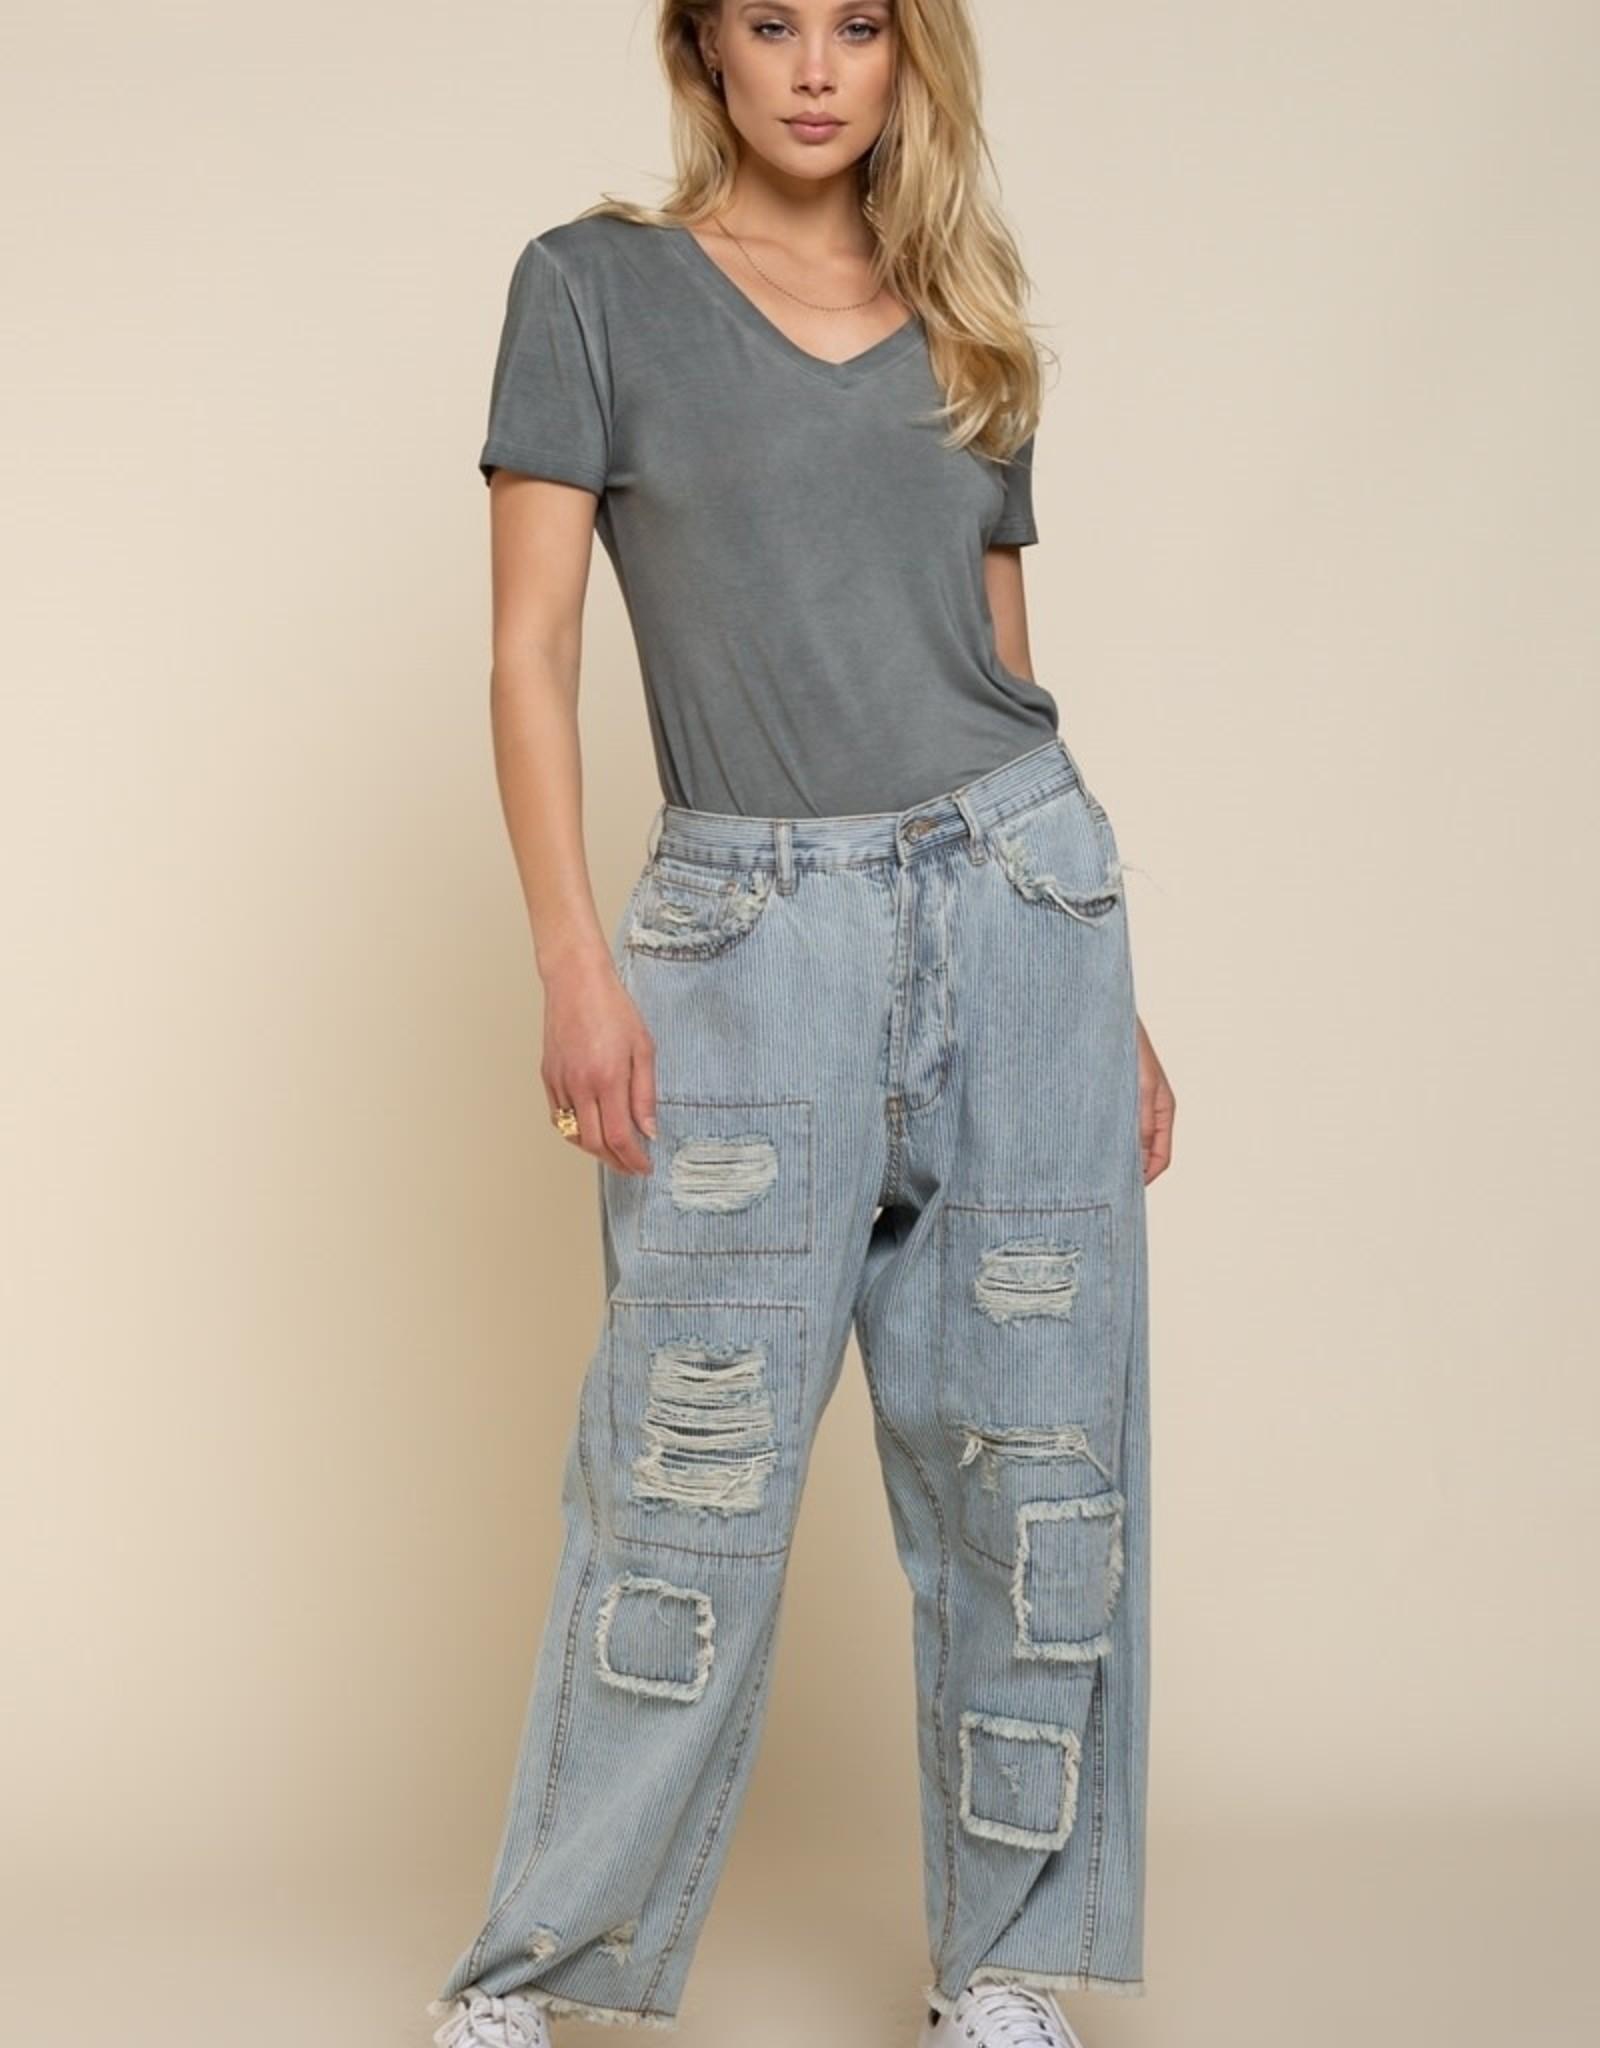 - Vintage Wash Charcoal Short Sleeve Top